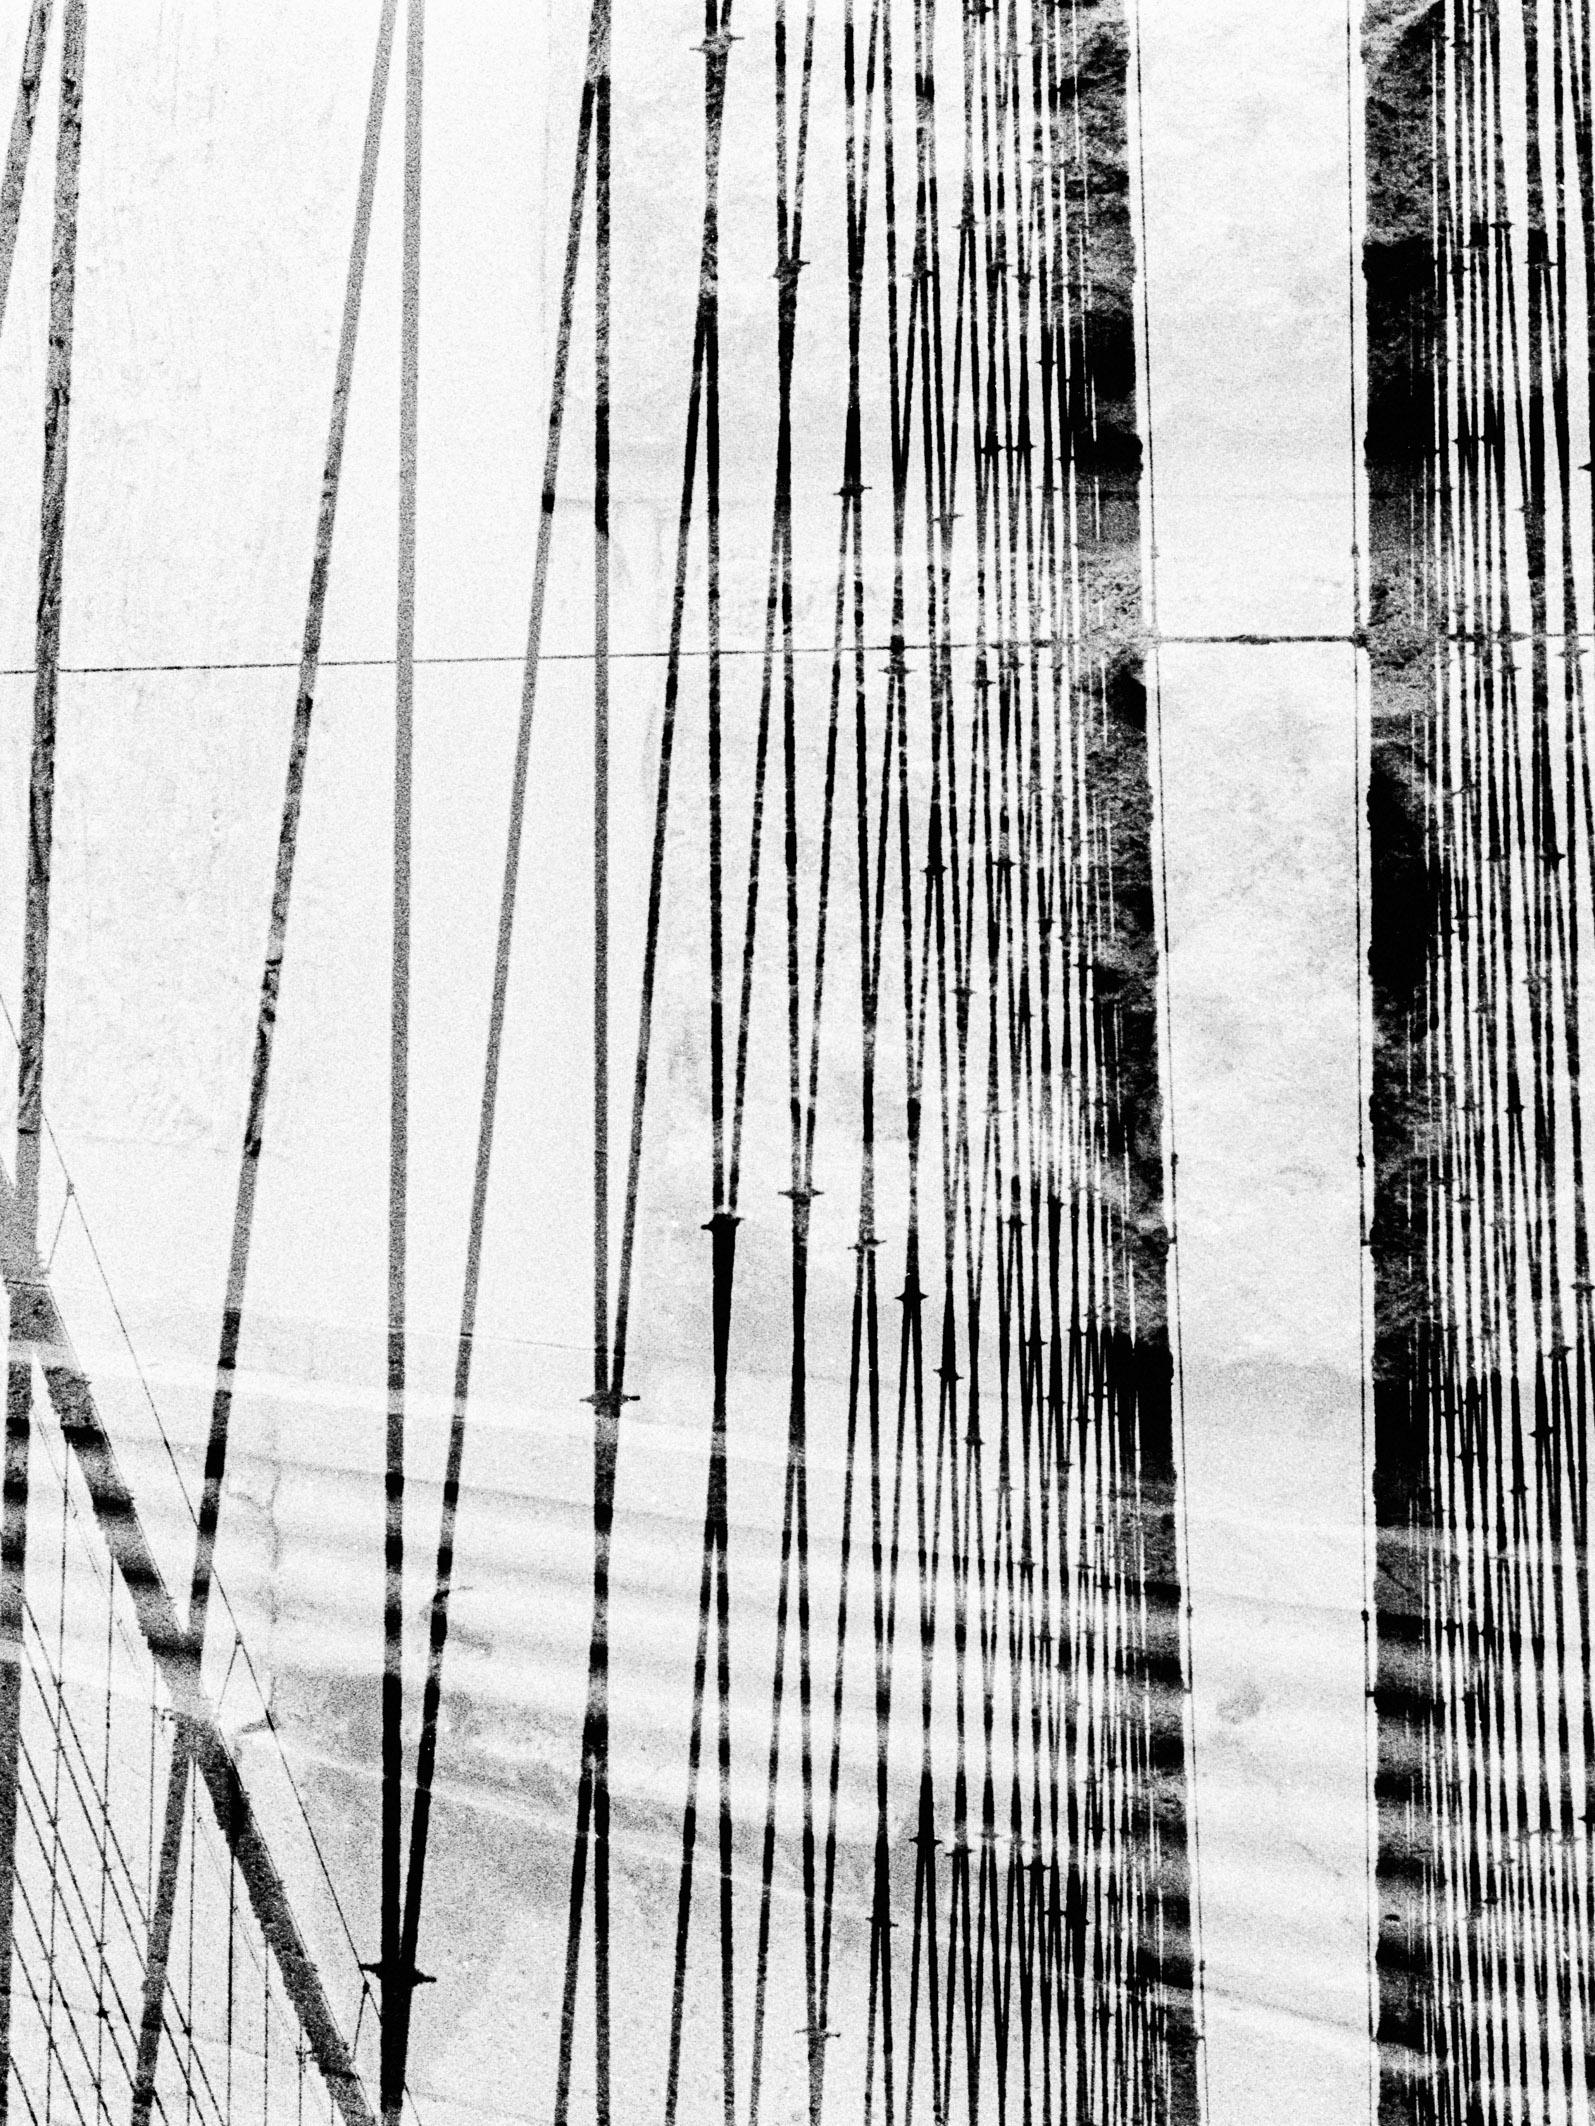 lines blurring # 06